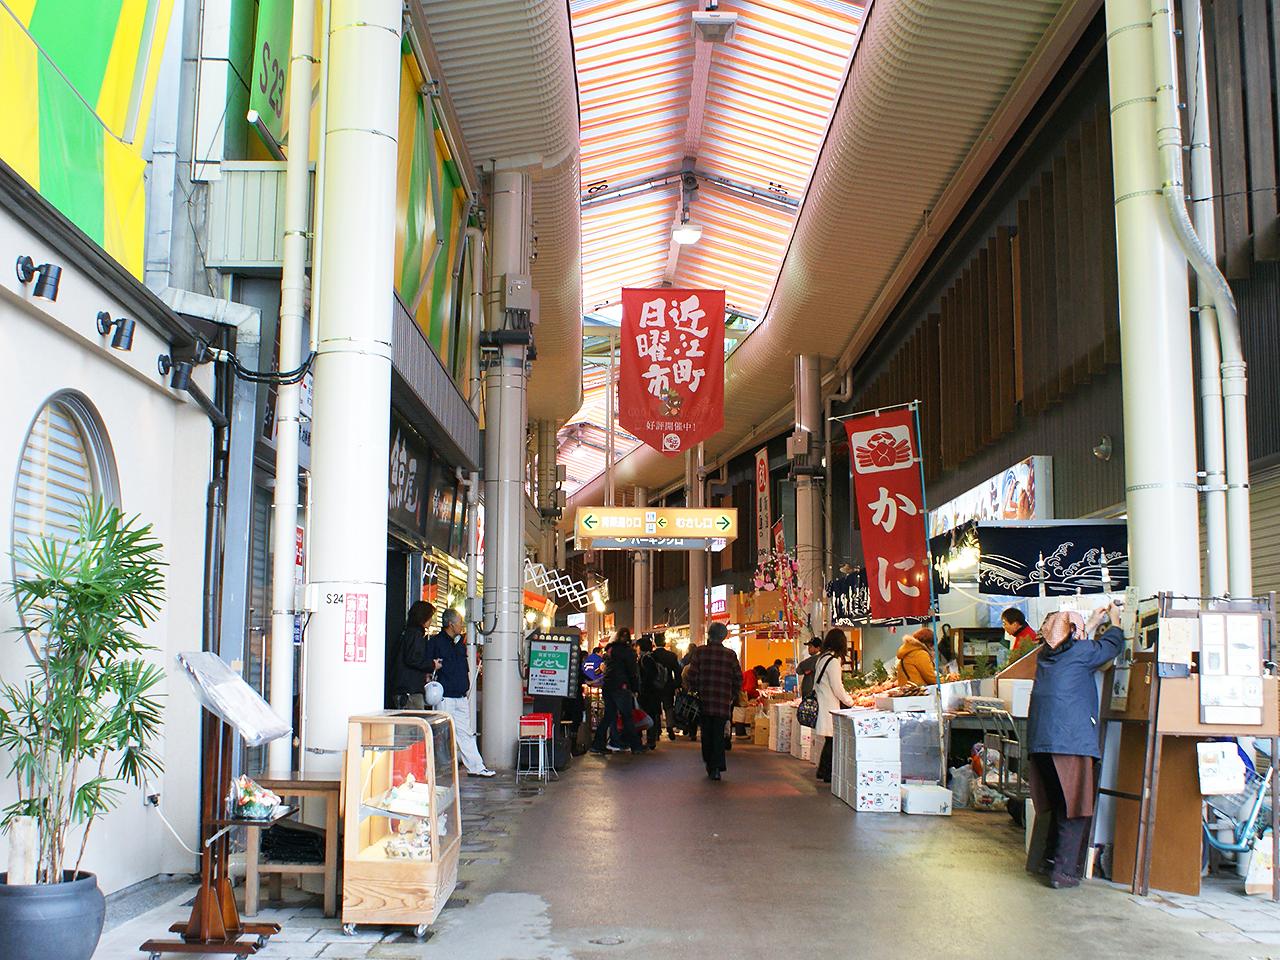 http://moritetsu.info/travel/img/DSC05872ss.jpg